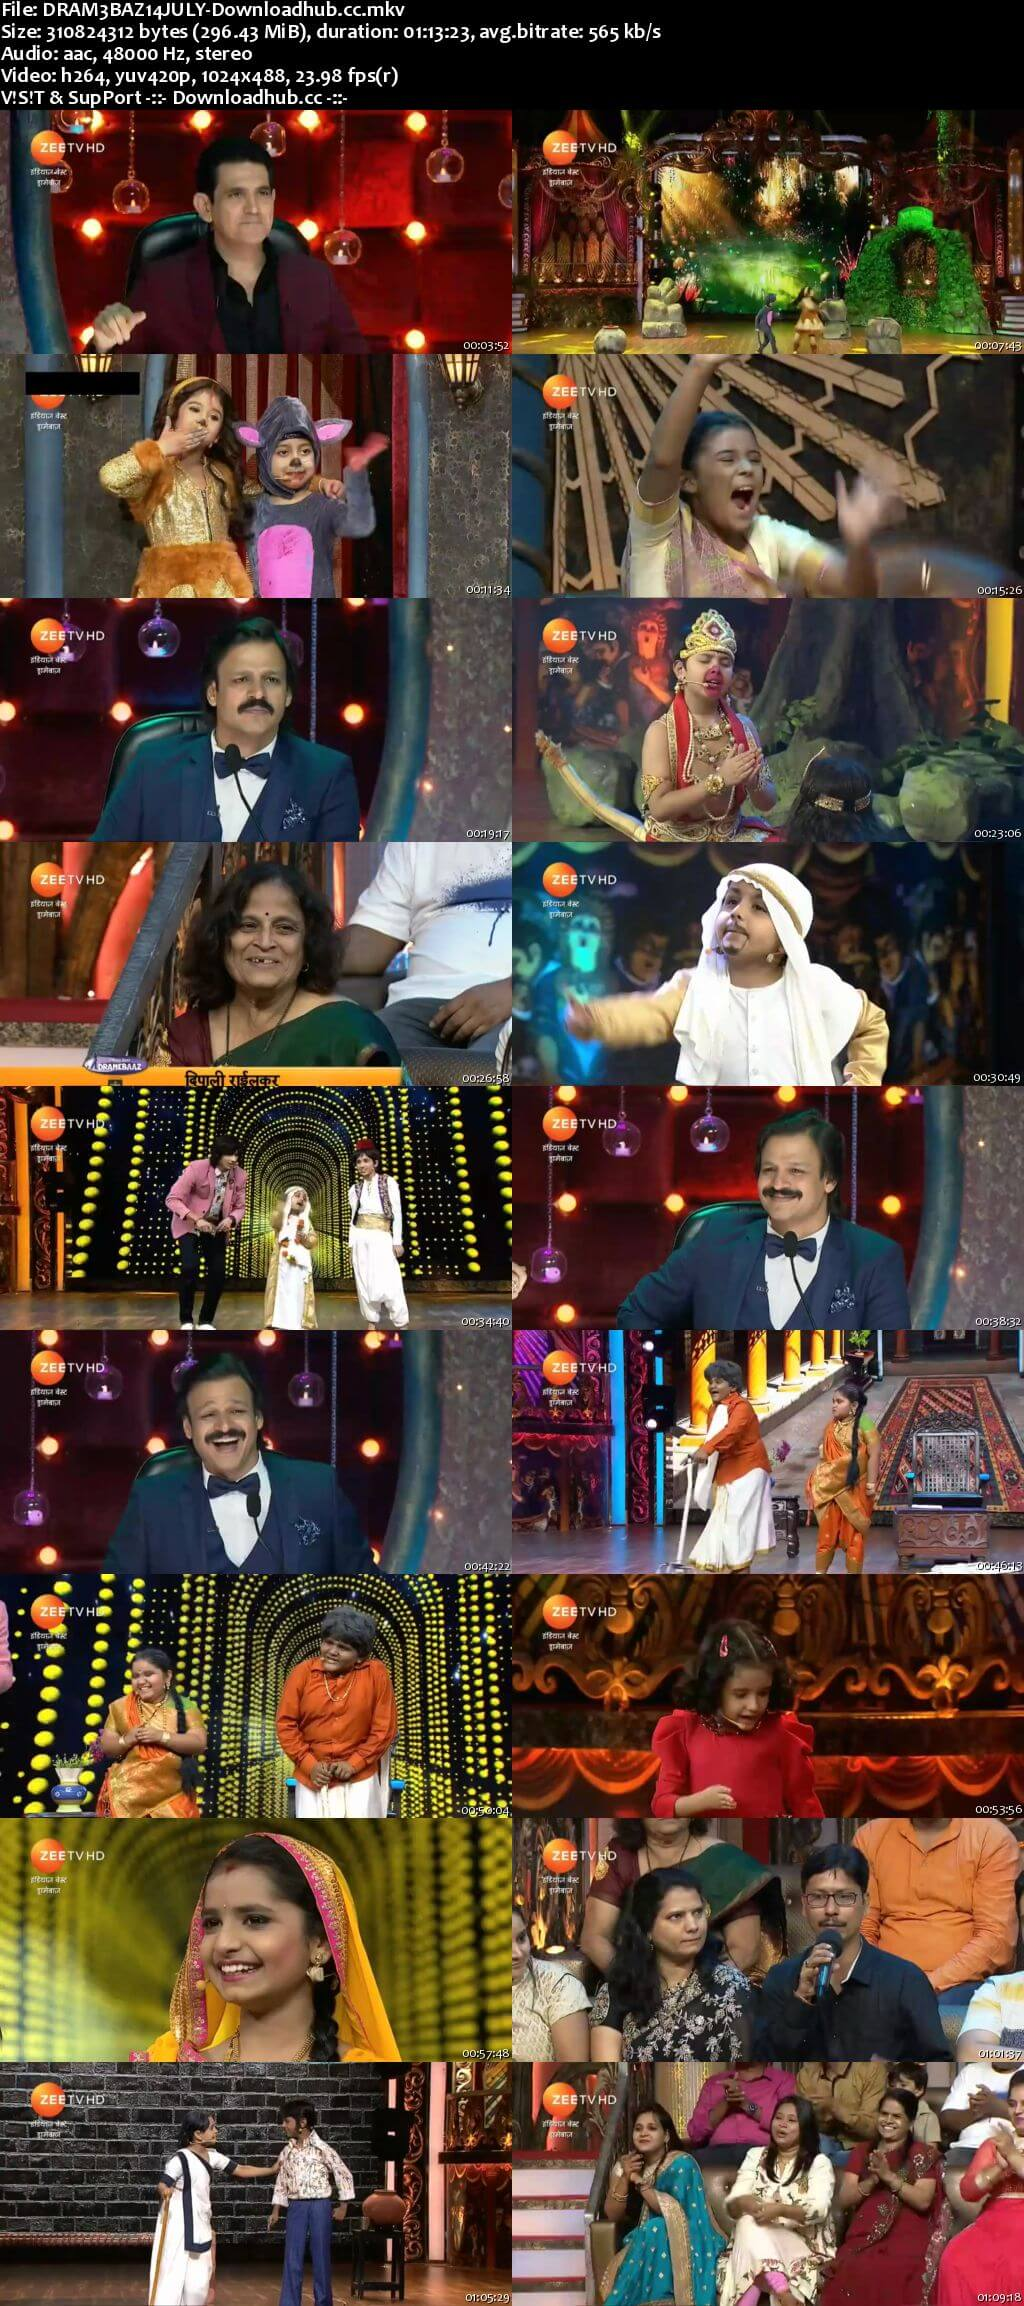 Indias Best Dramebaaz Season 3 14 July 2018 Episode 05 HDTV 480p